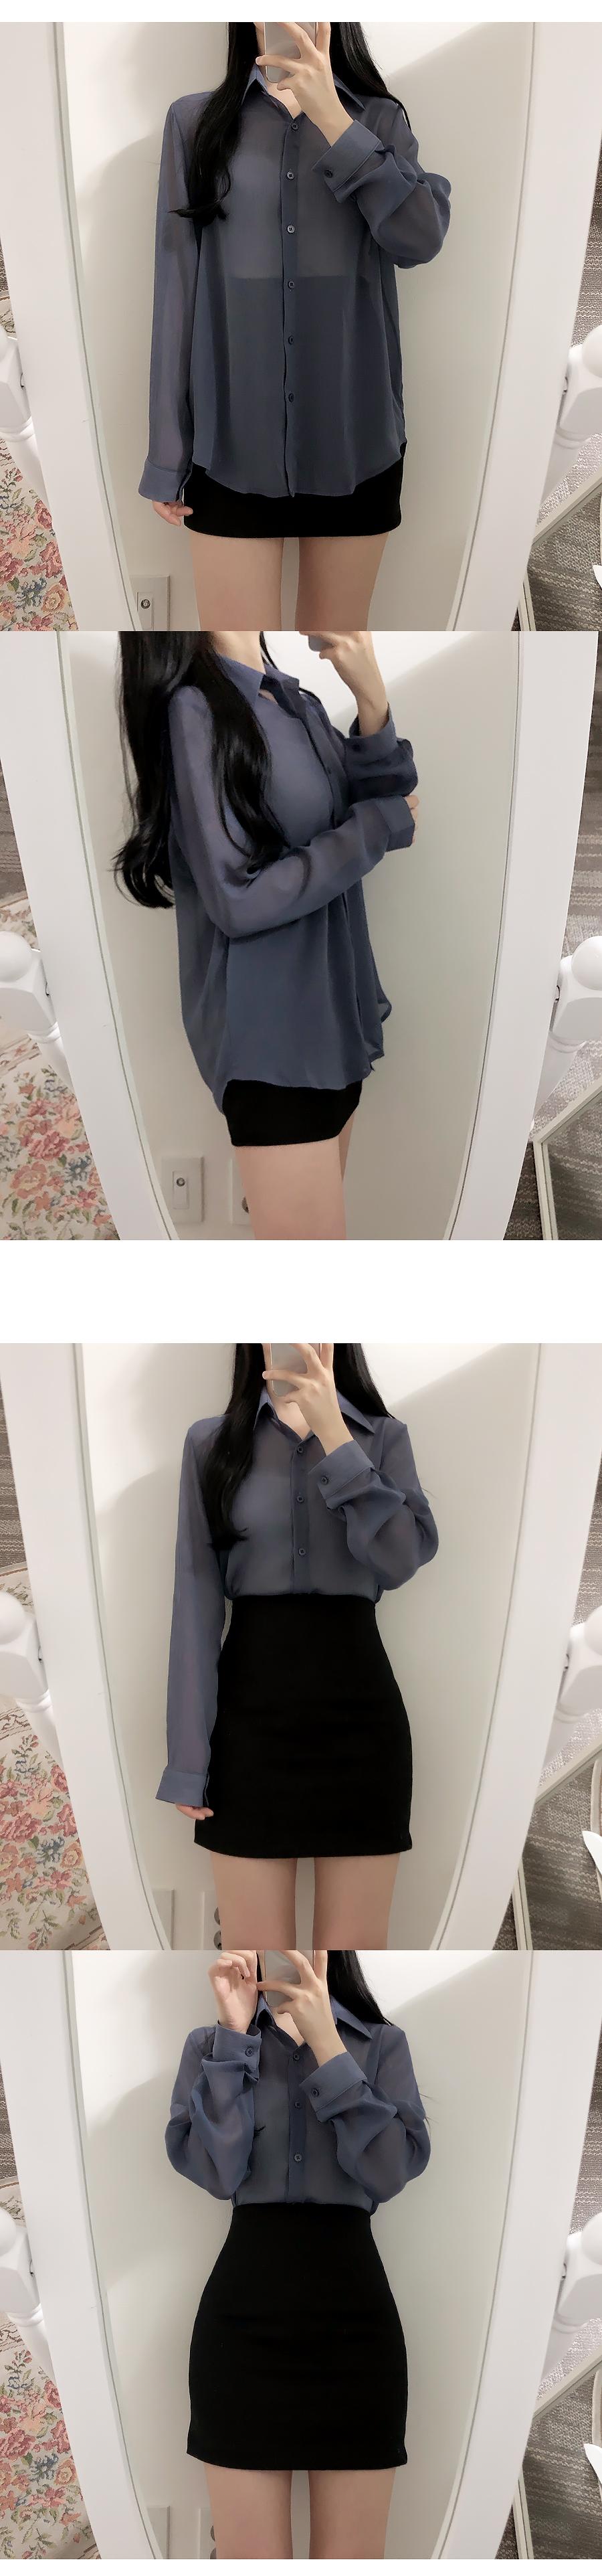 Self-made ♥ Nudie see-through shirtblouse